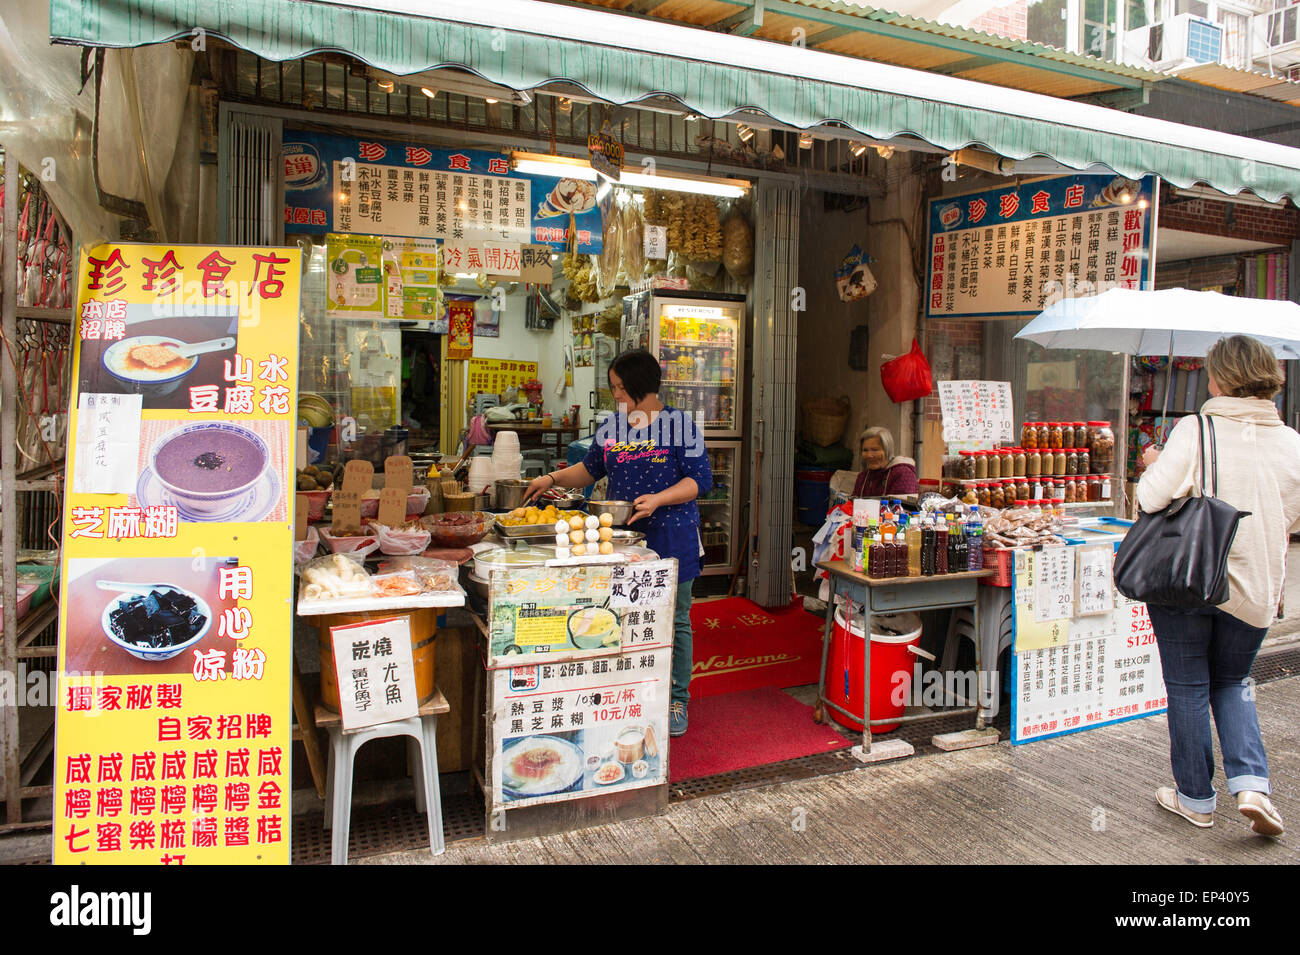 Tai O fishing Village outdoor street food market located on Lantau Island, Hong Kong, China - Stock Image